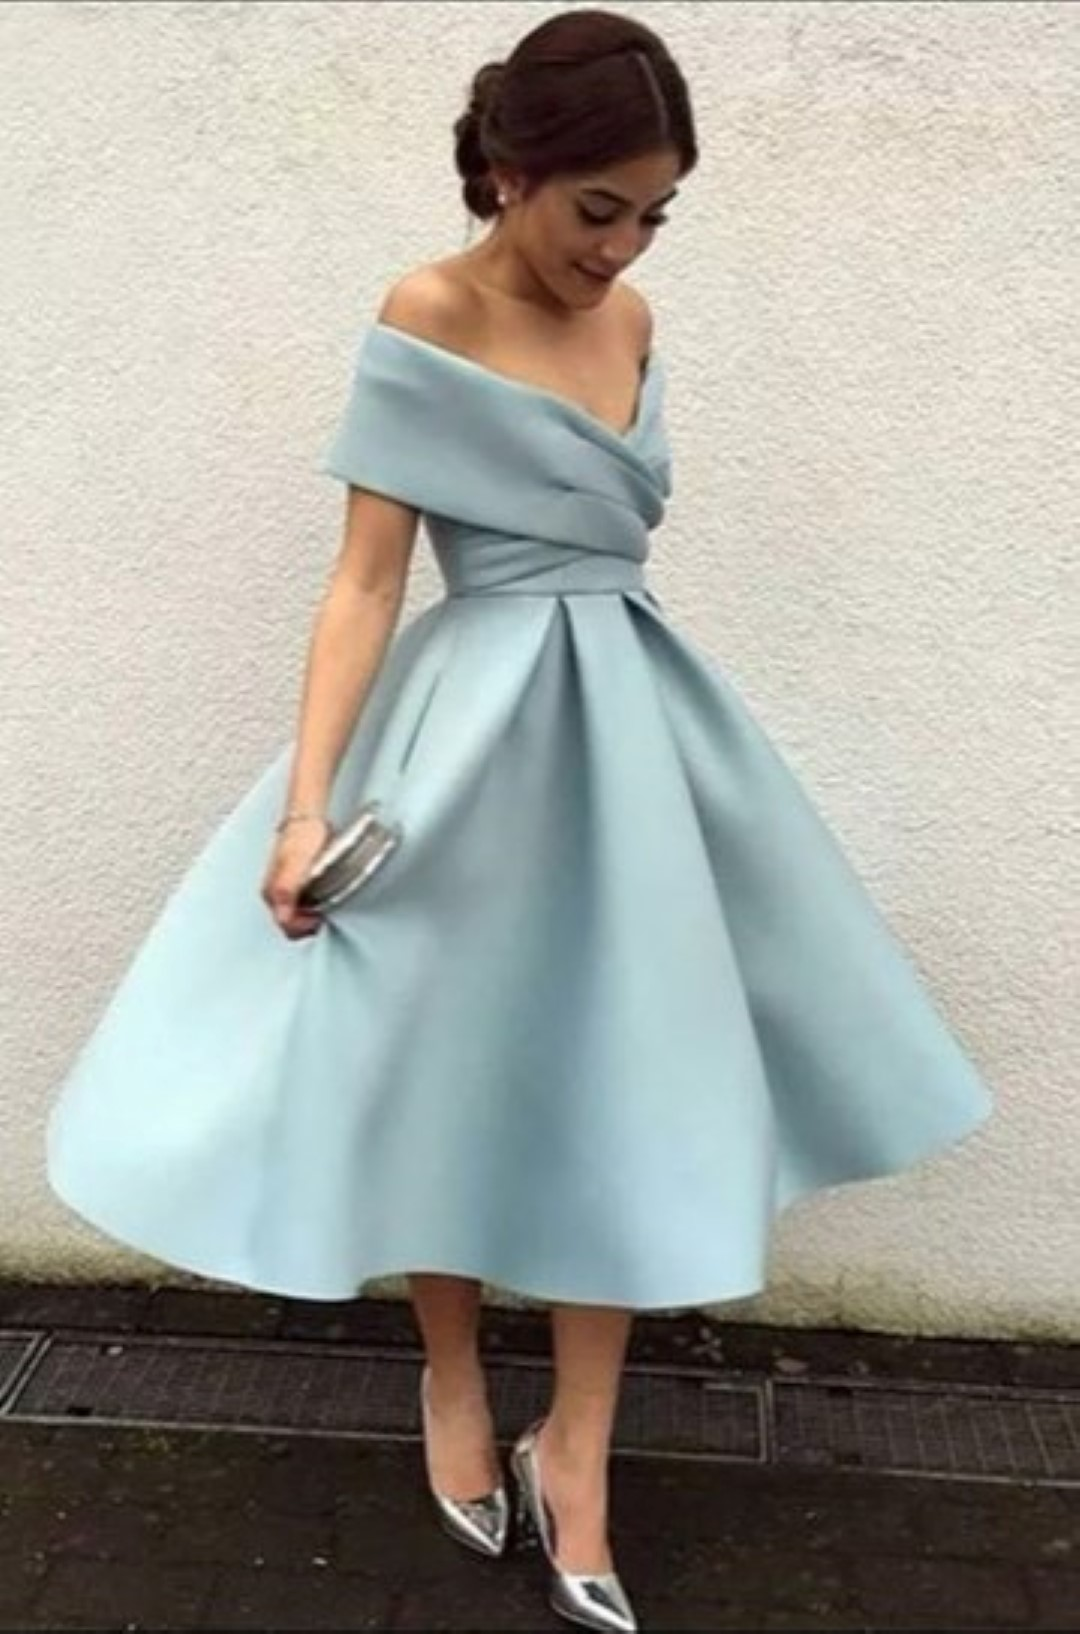 PEARL OFF THE SHOULDER DRESS PALE BLUE